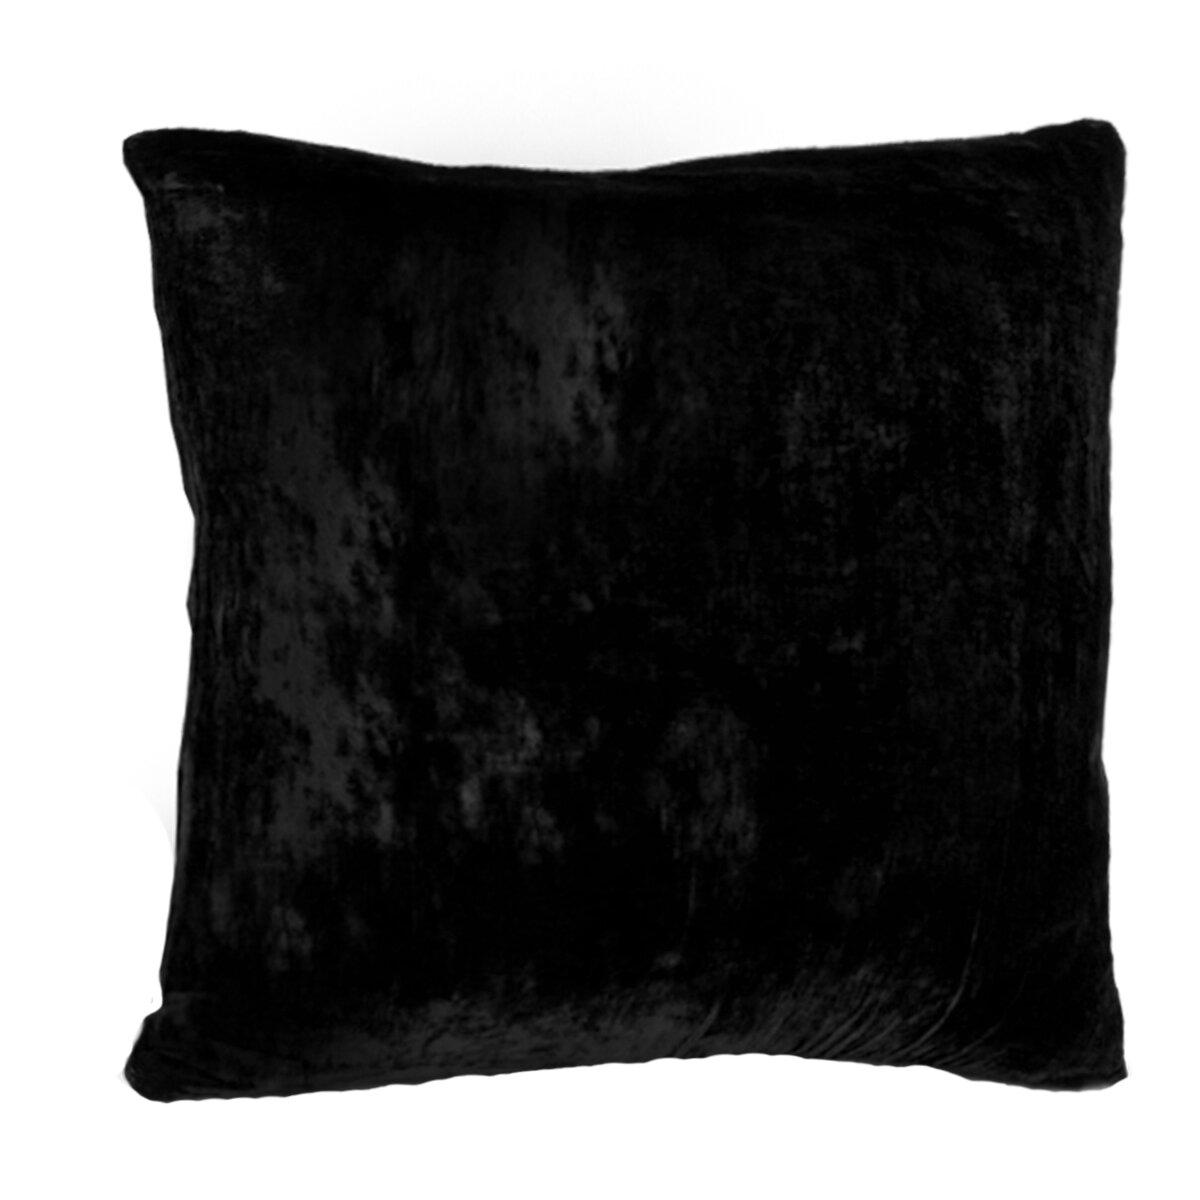 Throw Pillows Vintage Fabric : ArtOFabric Vintage Triple Velvet Ultra Soft Throw Pillow & Reviews Wayfair